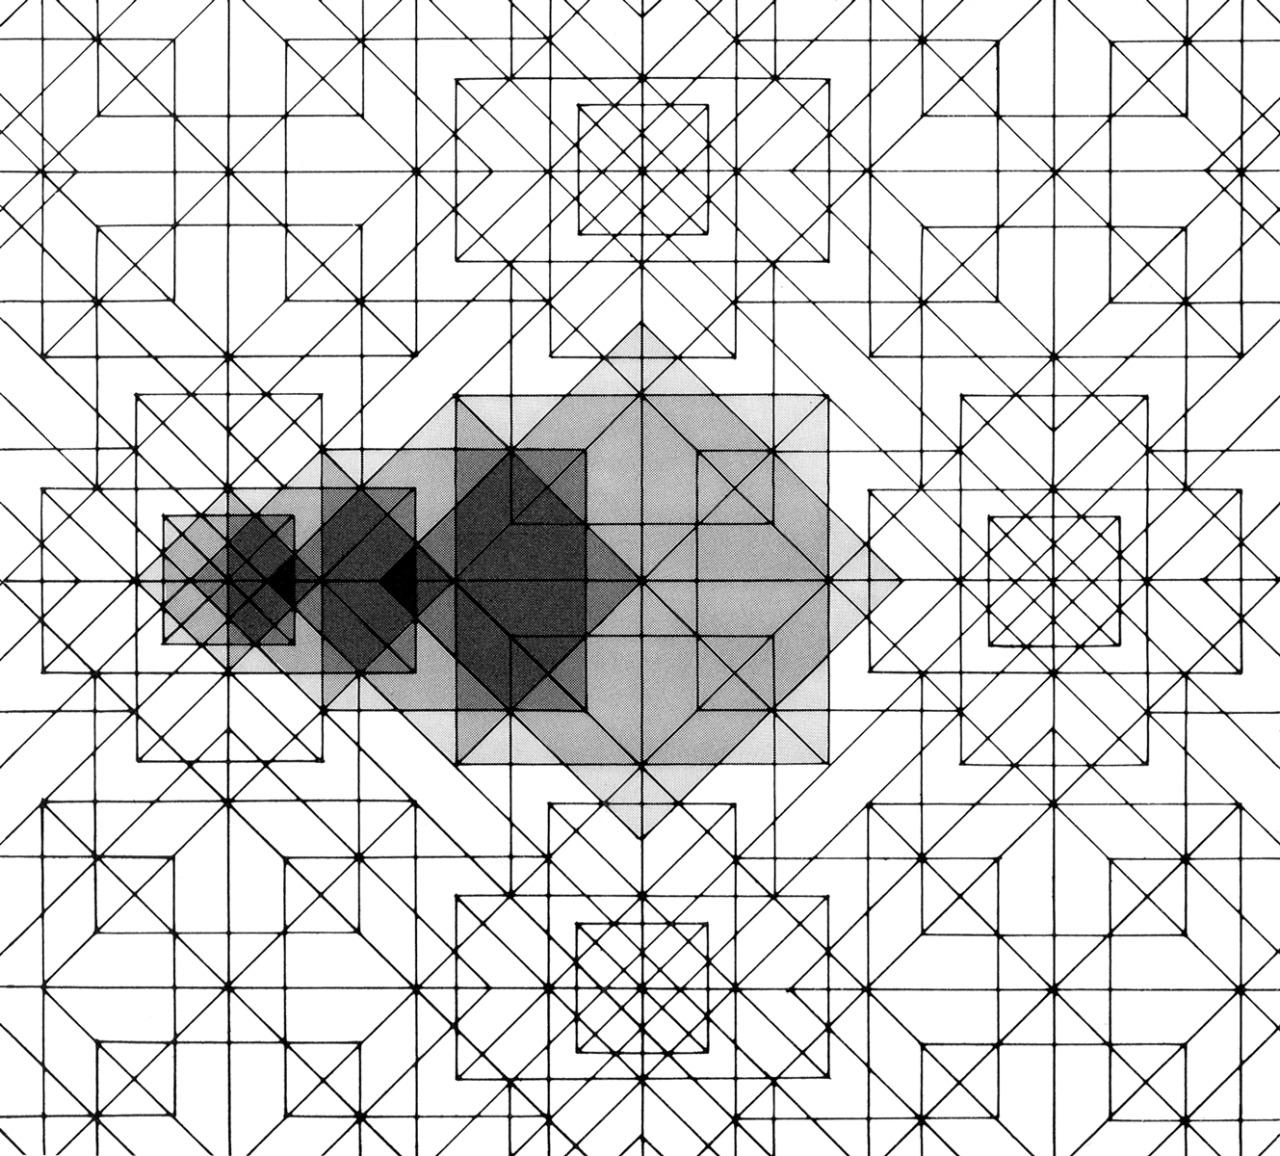 1280x1156 Theory In Practice Miami University Art Museumwhen Designing